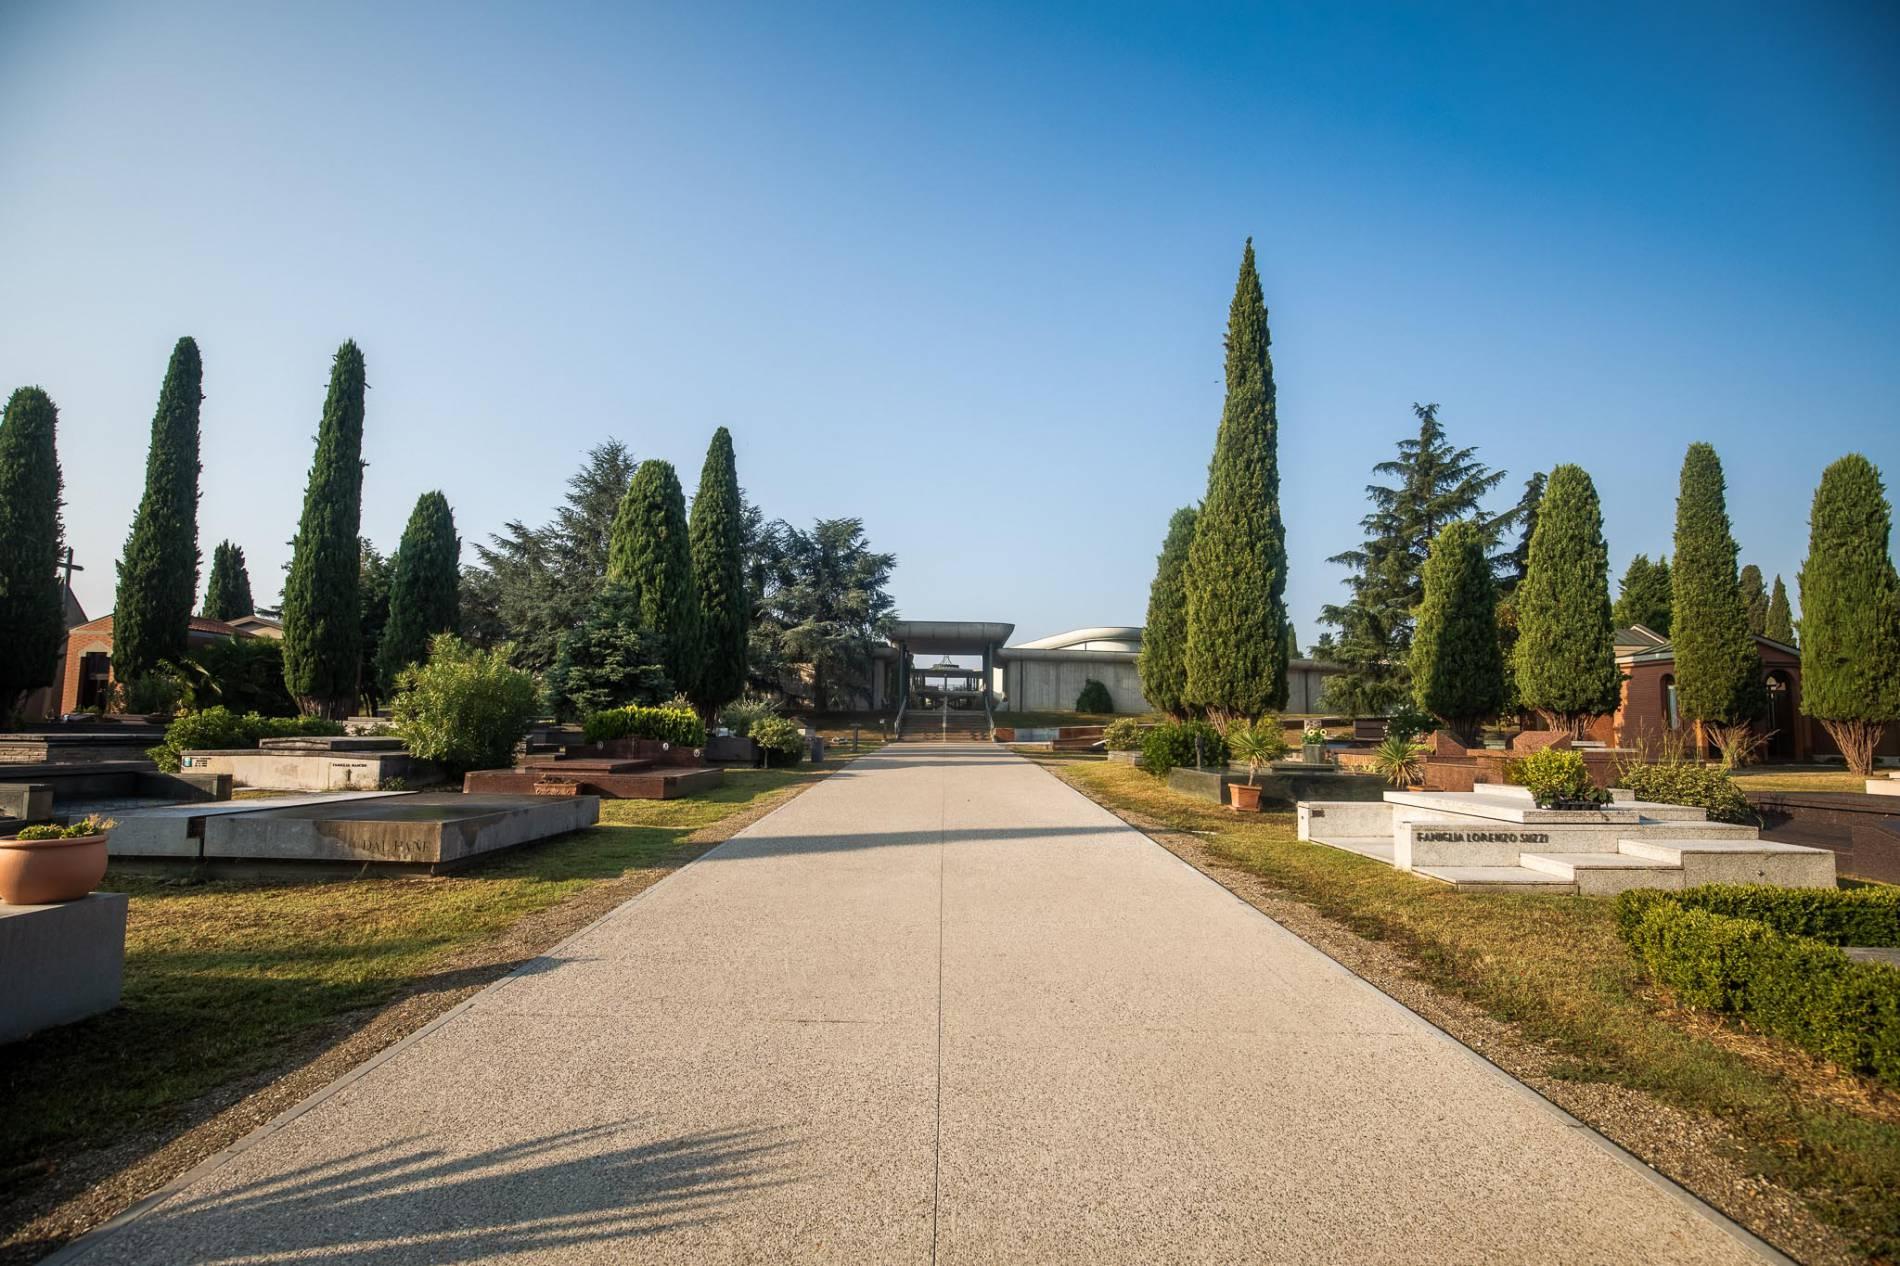 riapertura-cimiteri-4-maggio-coronavirus-imola